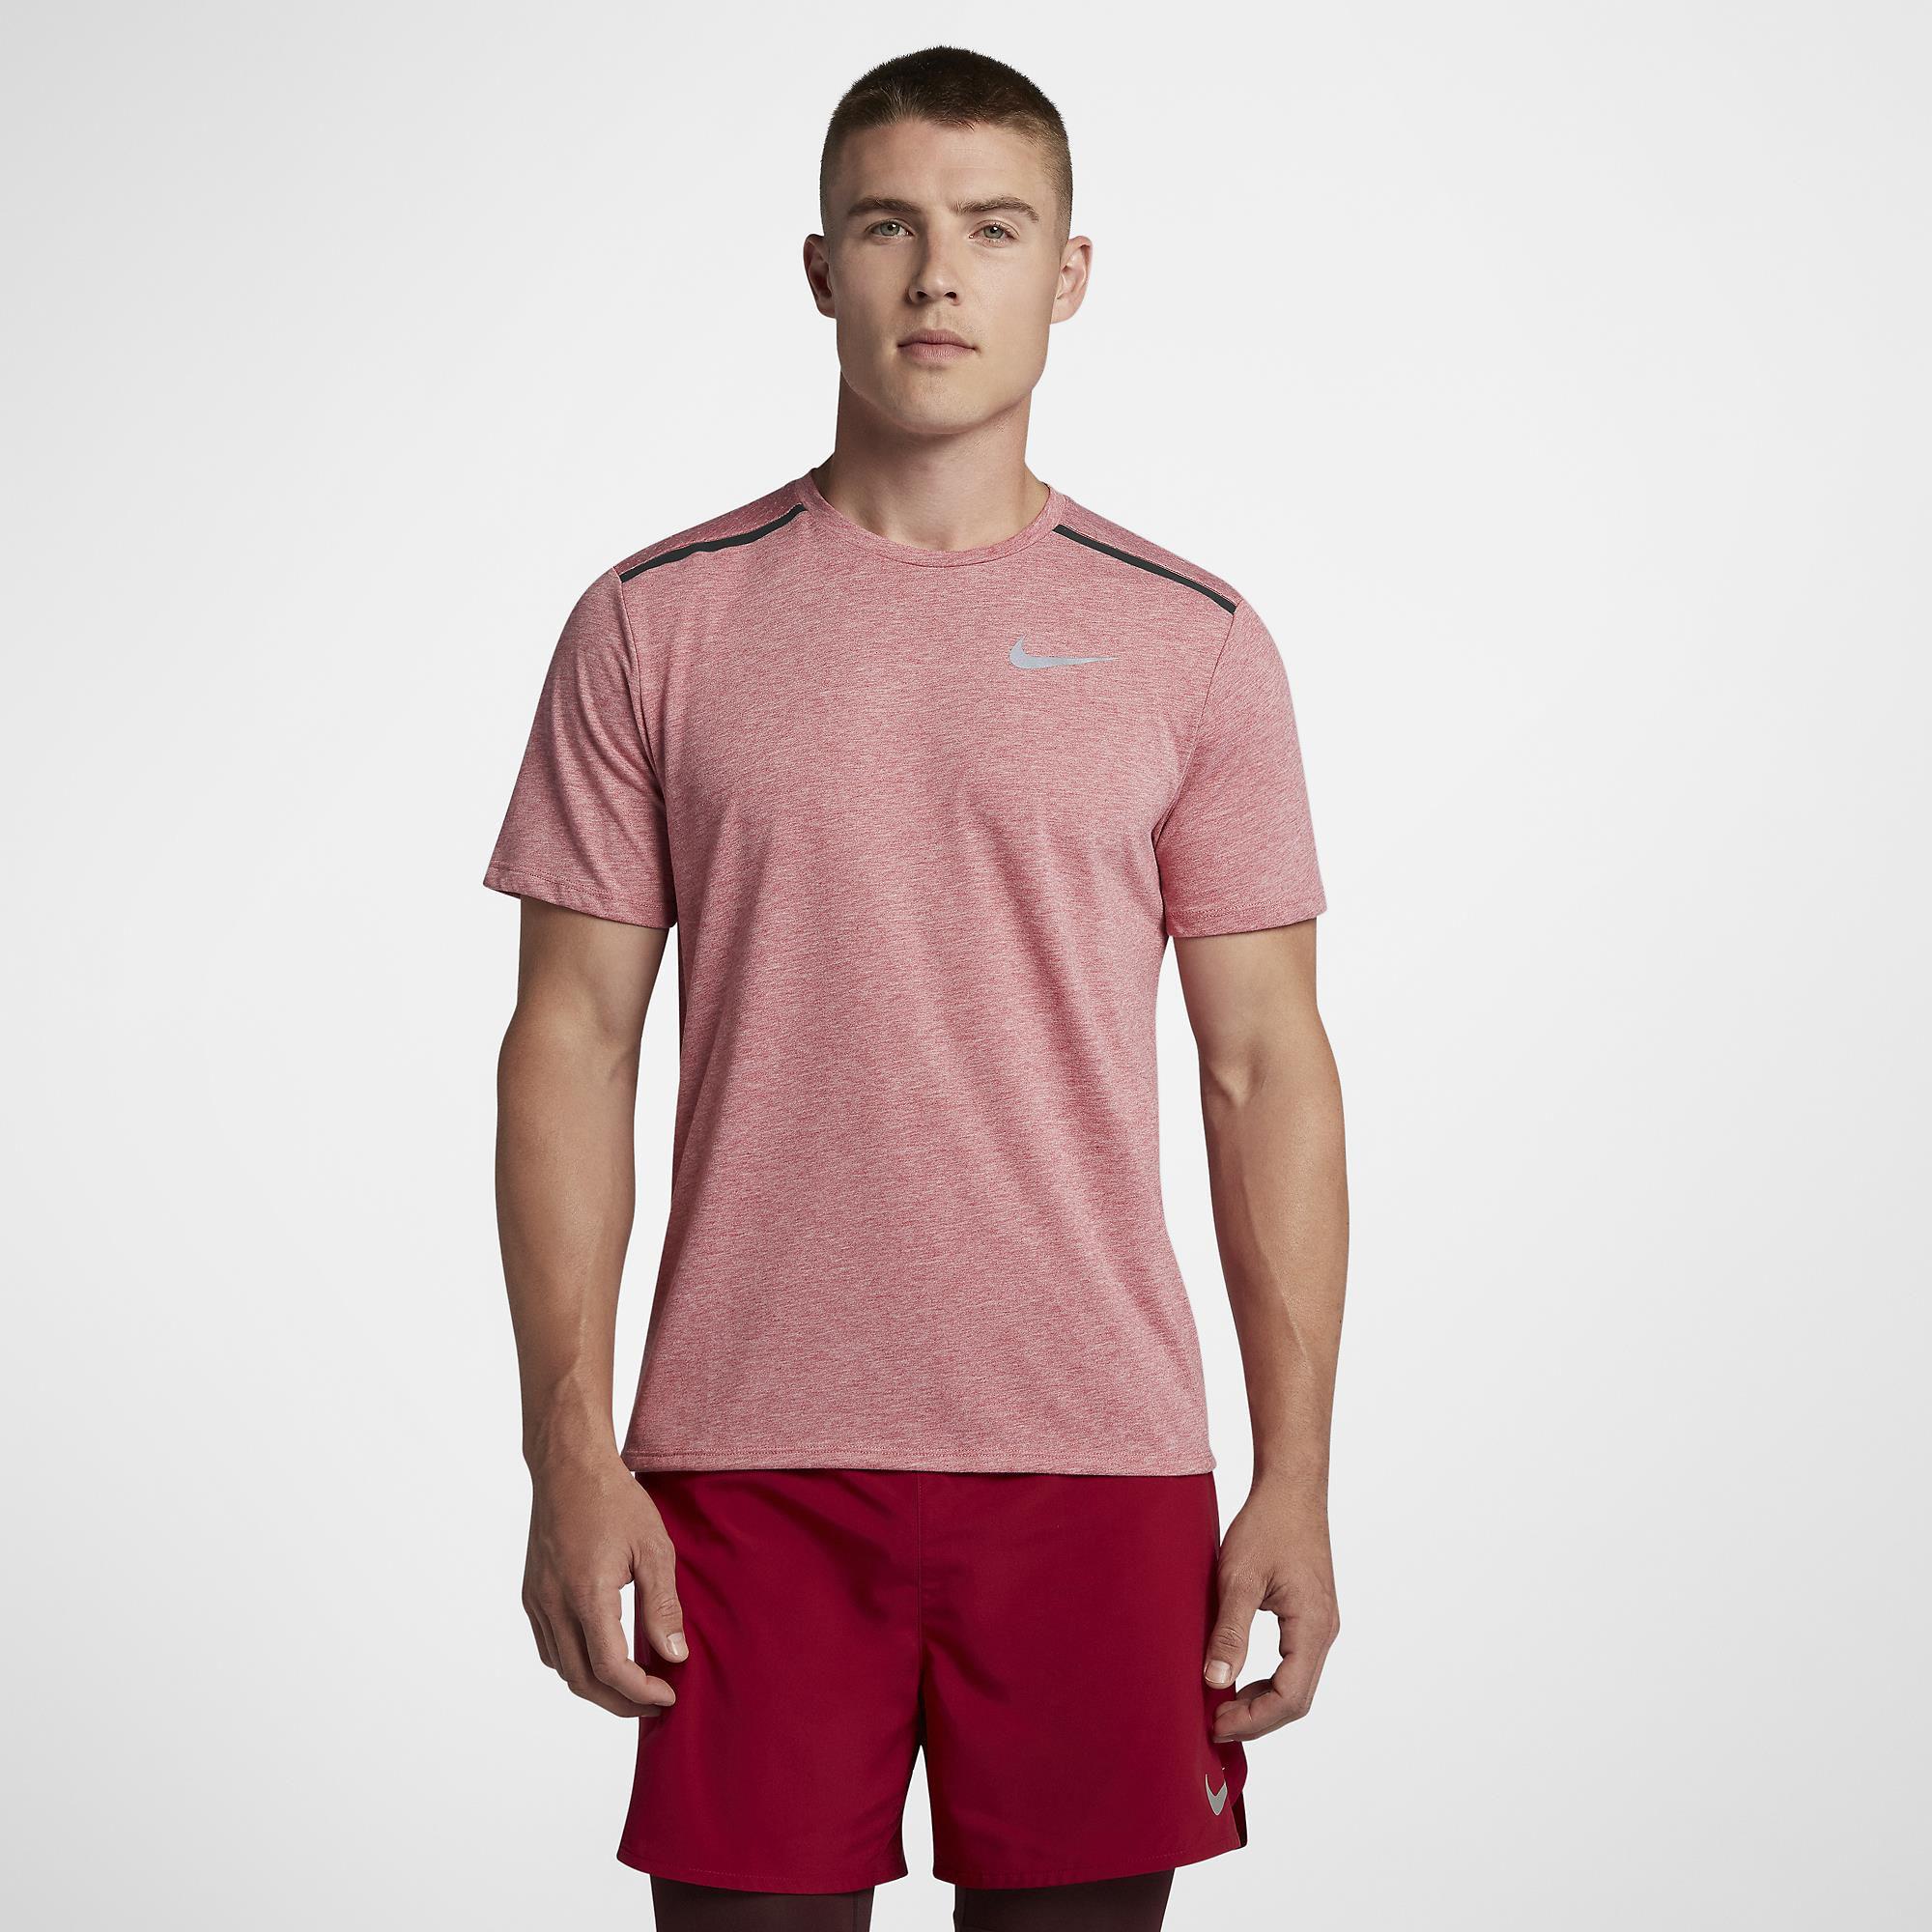 a489beea2ccbd Camisa Maculina Nike Dri-fit Tailwind - Rosa - Titanes Esportes